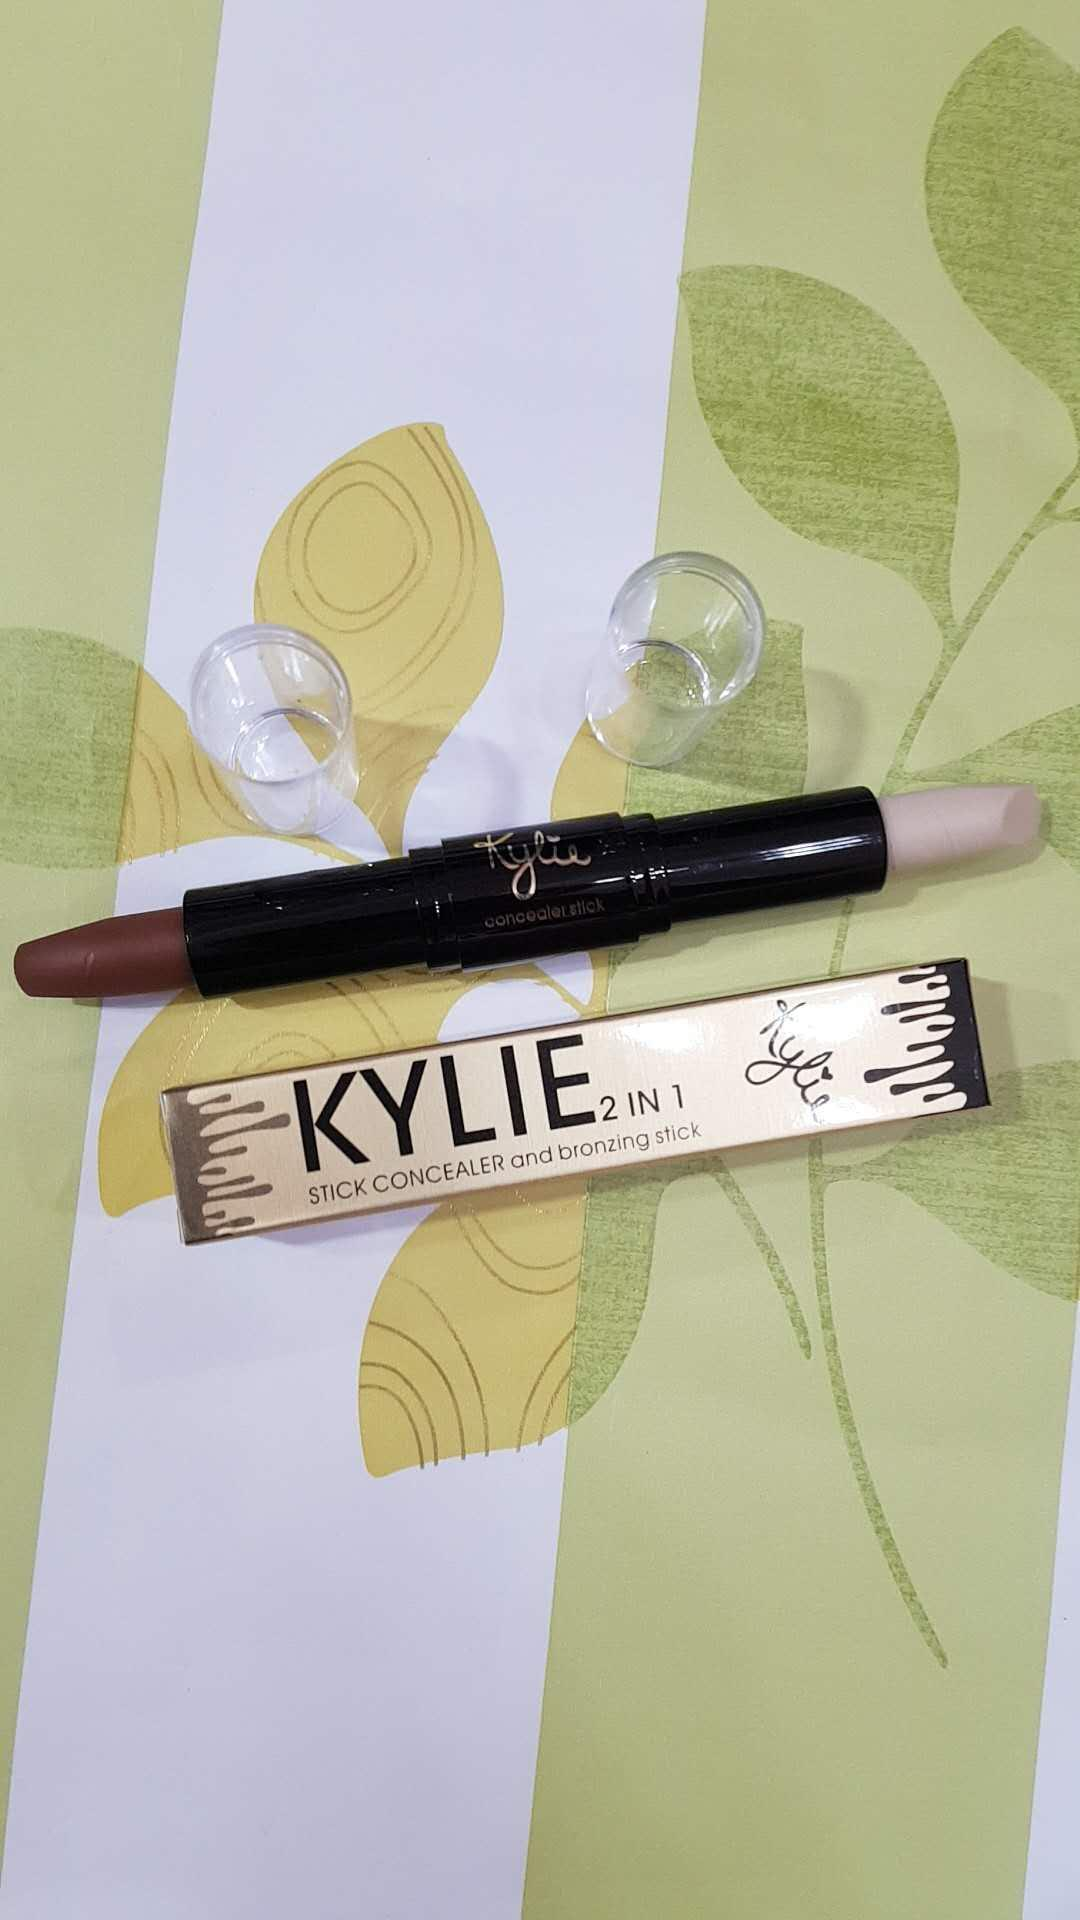 KYLIE- stick concealer and bronzing stick-02 Philippines